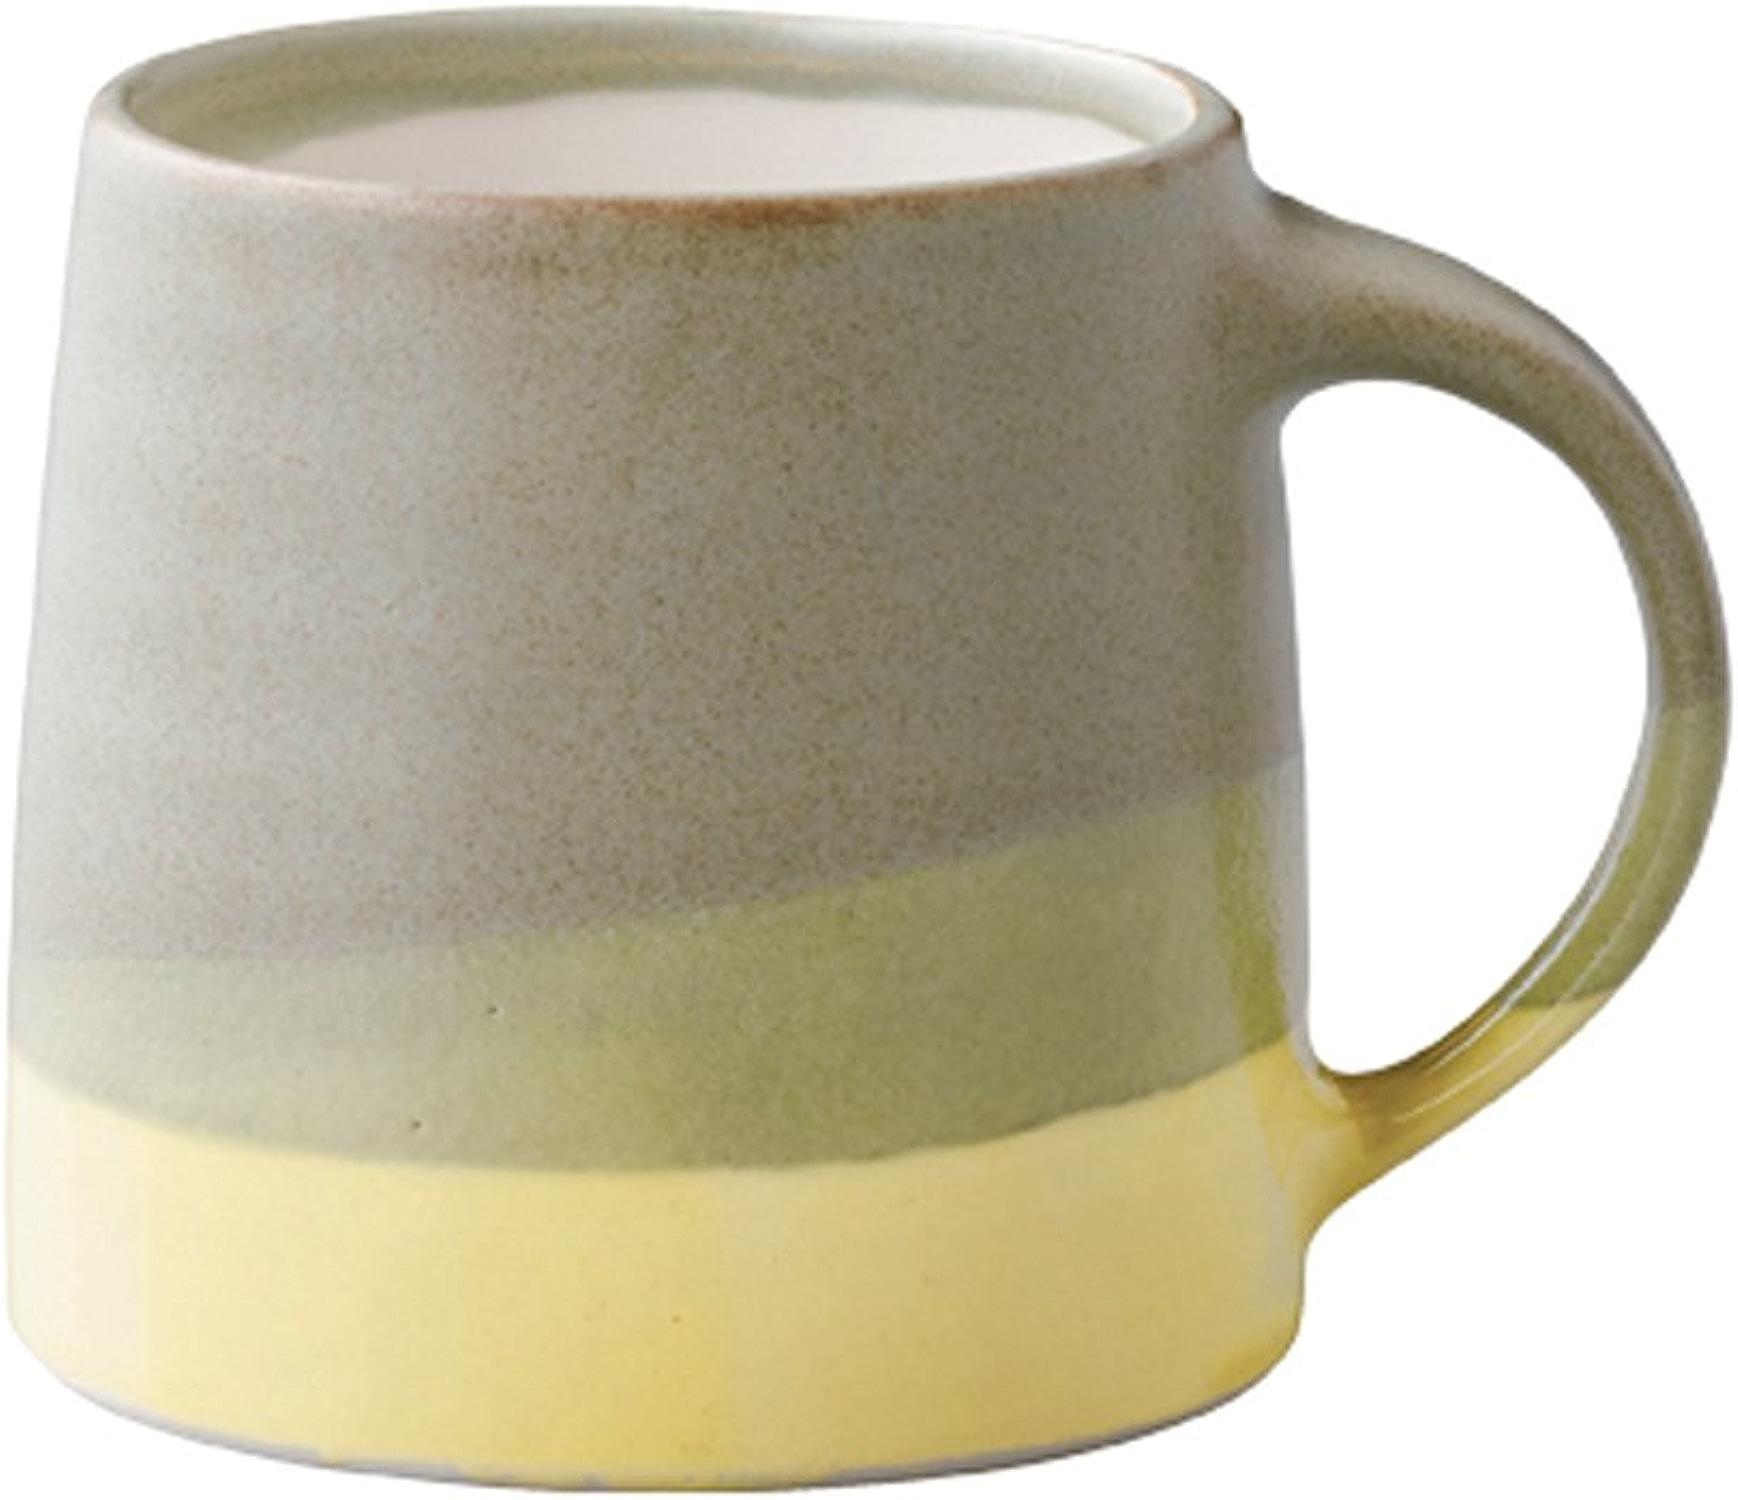 KINTO Scs-s03Mug à café fabriqués 11oz Jaune